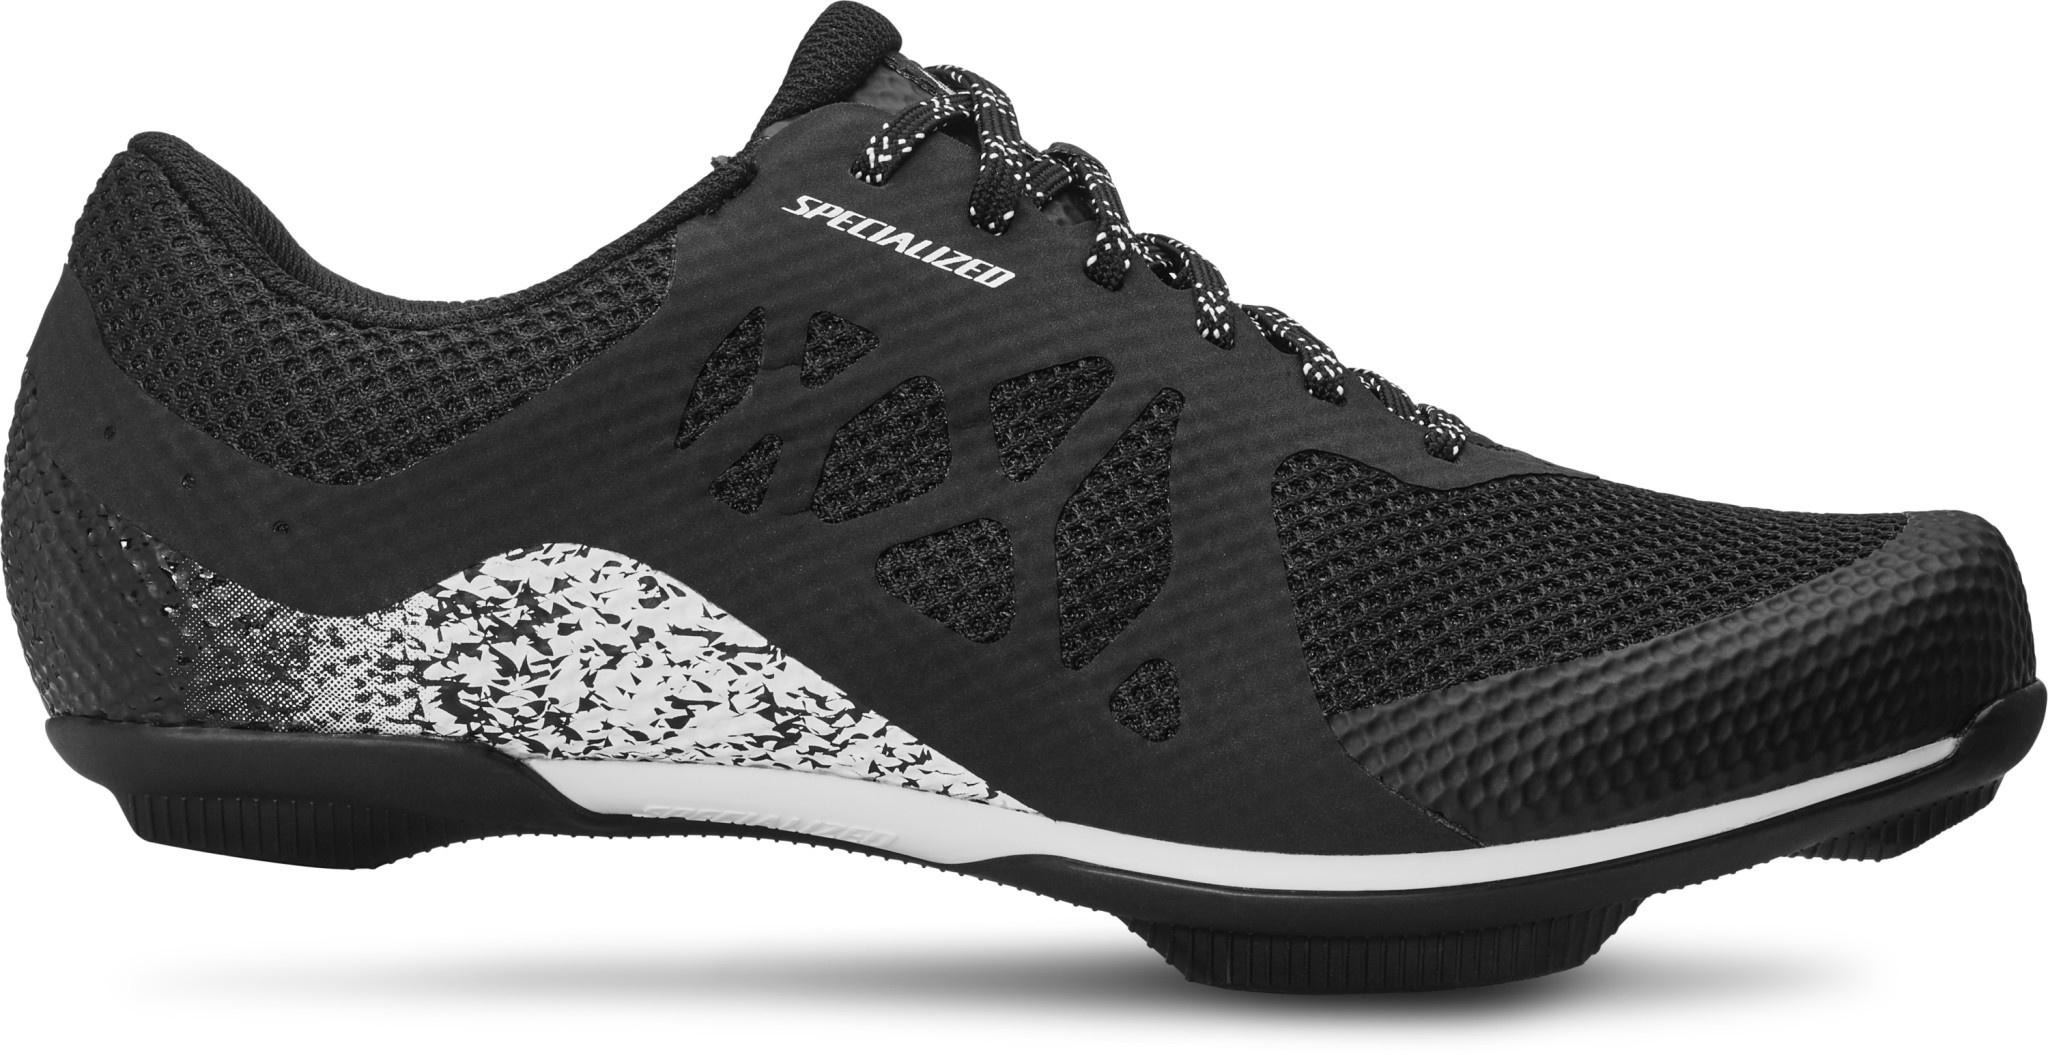 Specialized Women'S Remix Shoes